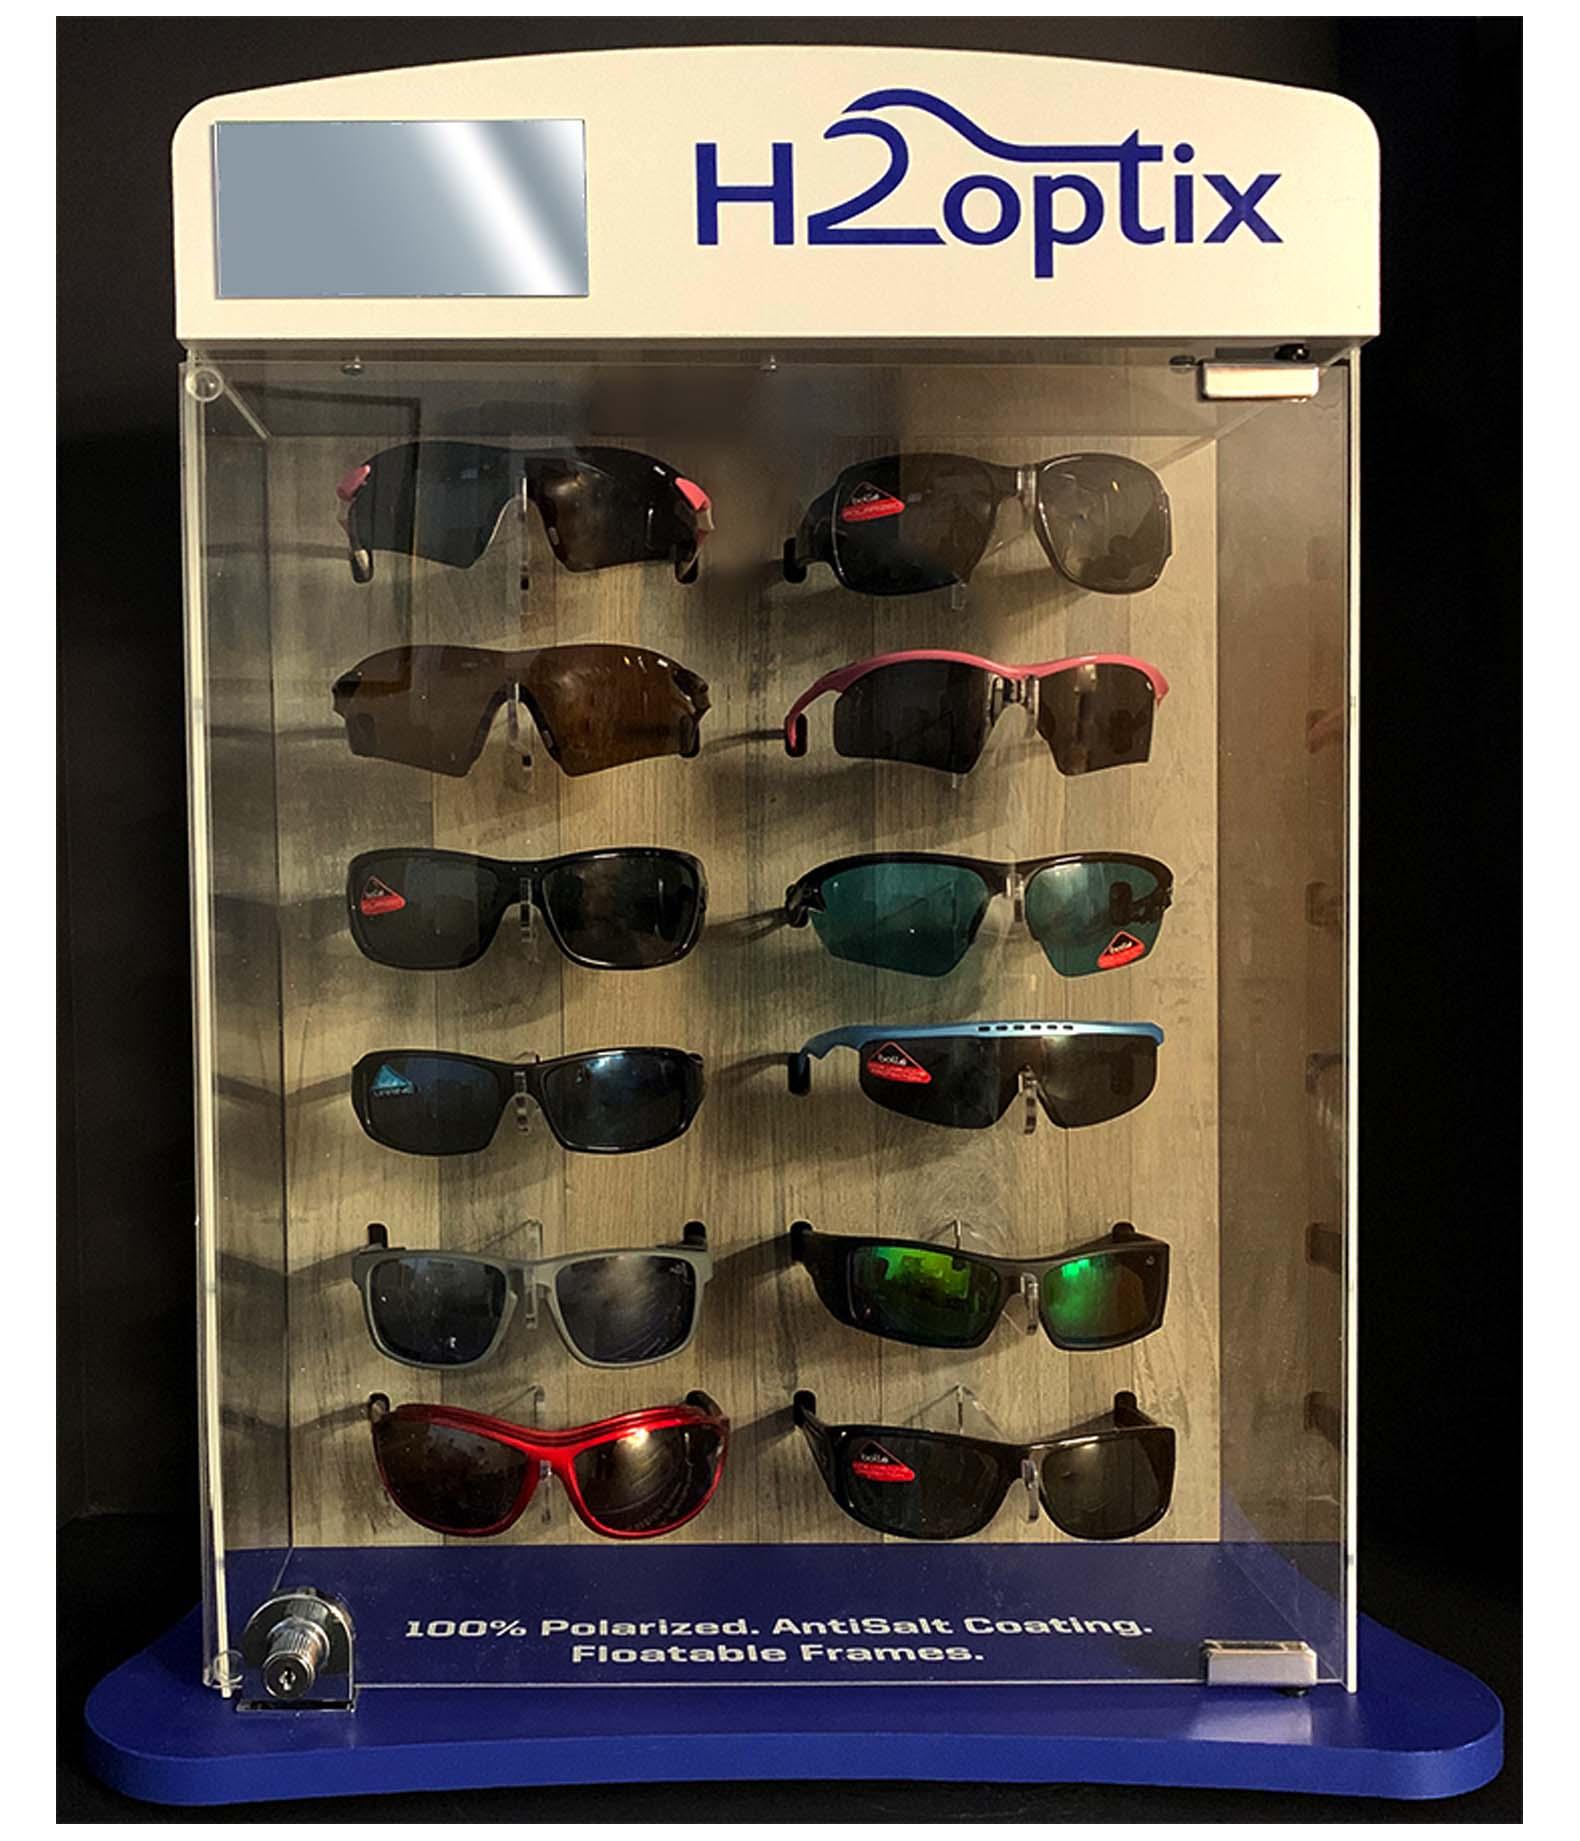 Product Merchandising - H2optix